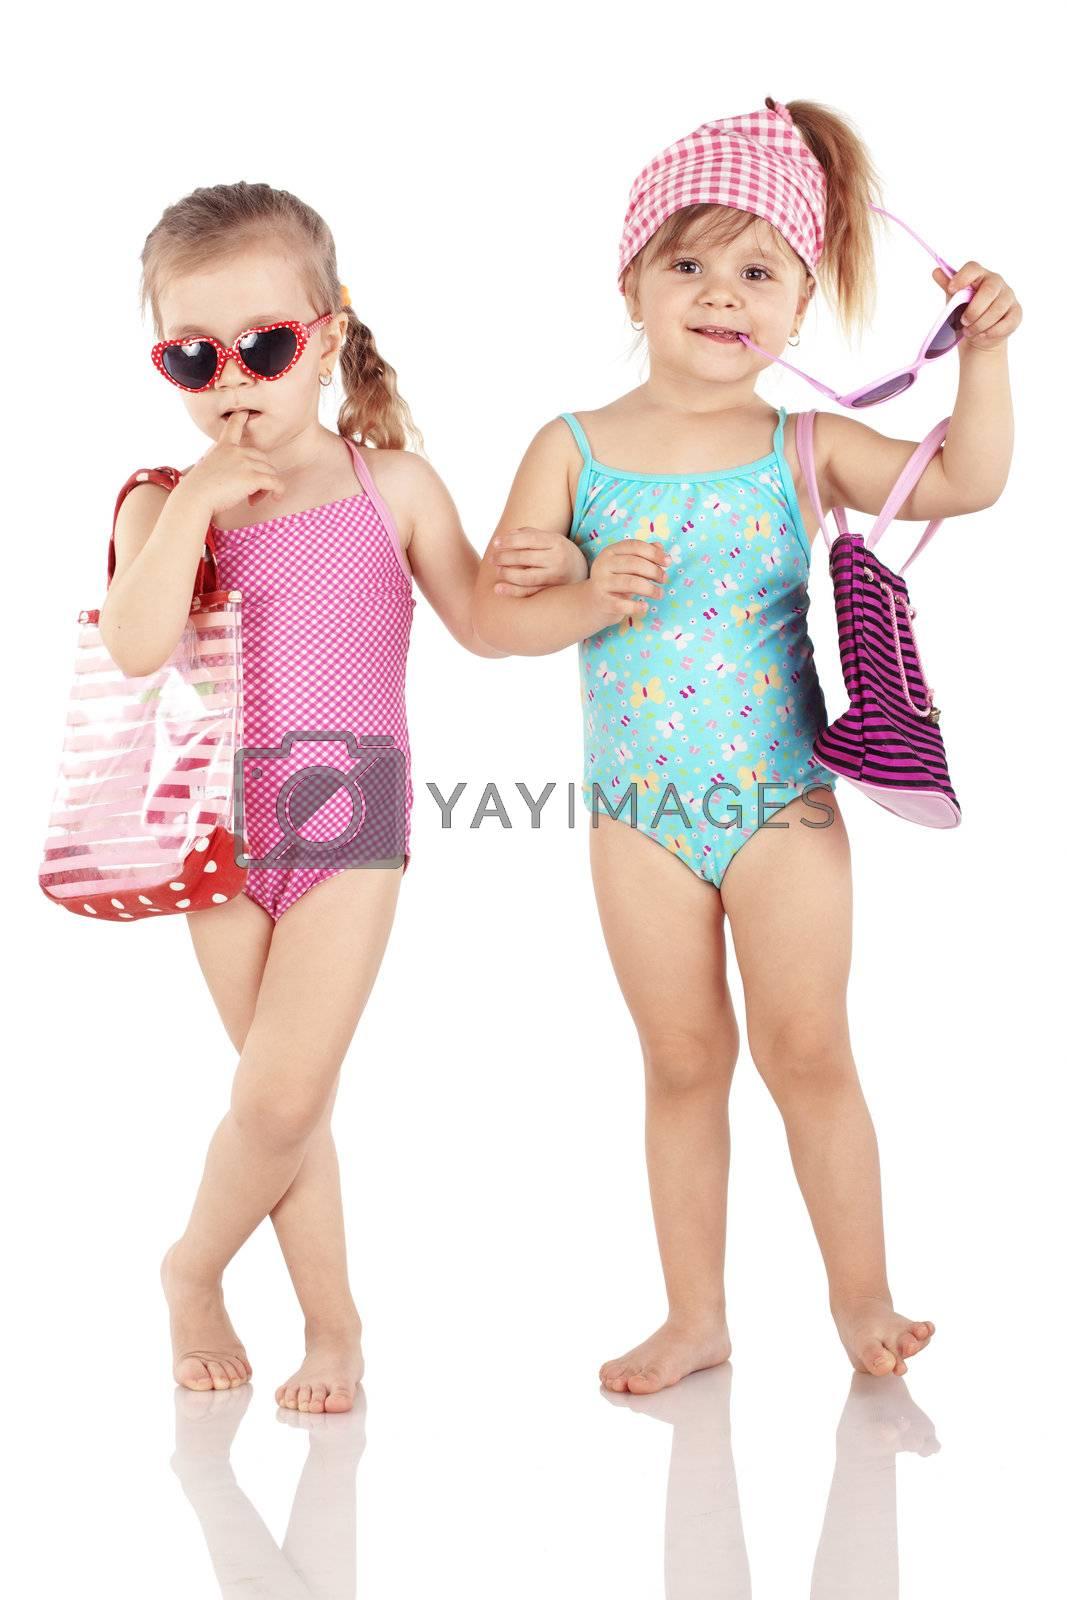 Studio series of cute fashion children wearing swimwear isolated on white background